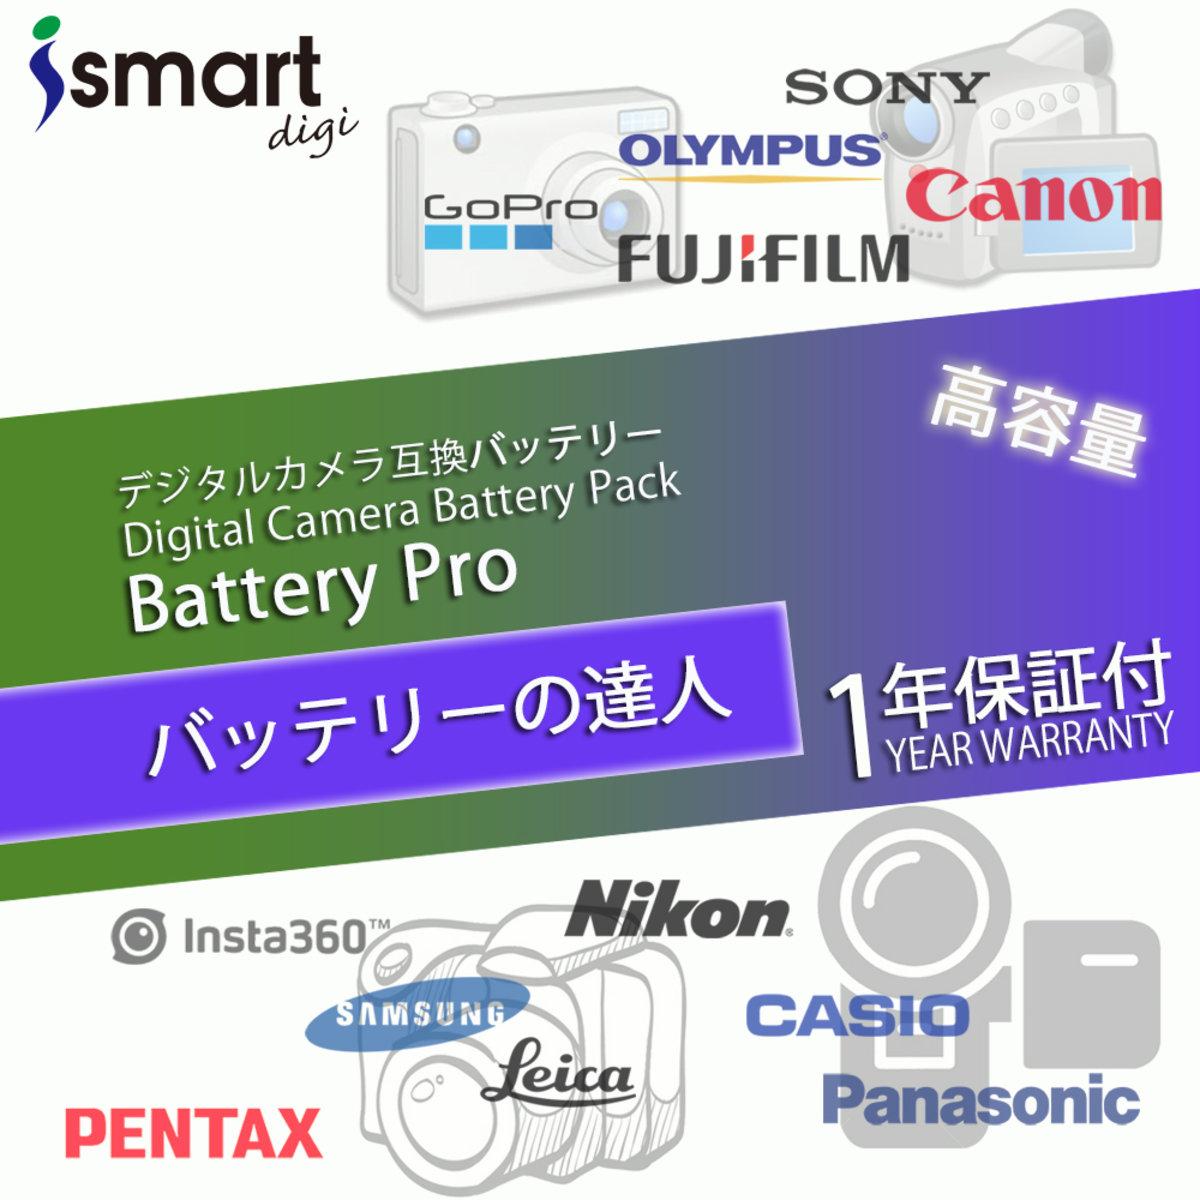 Casio Digital Camera Battery (For: Exilim EX-Z400, EX-Z500, EX-Z450, EX-FC1500)